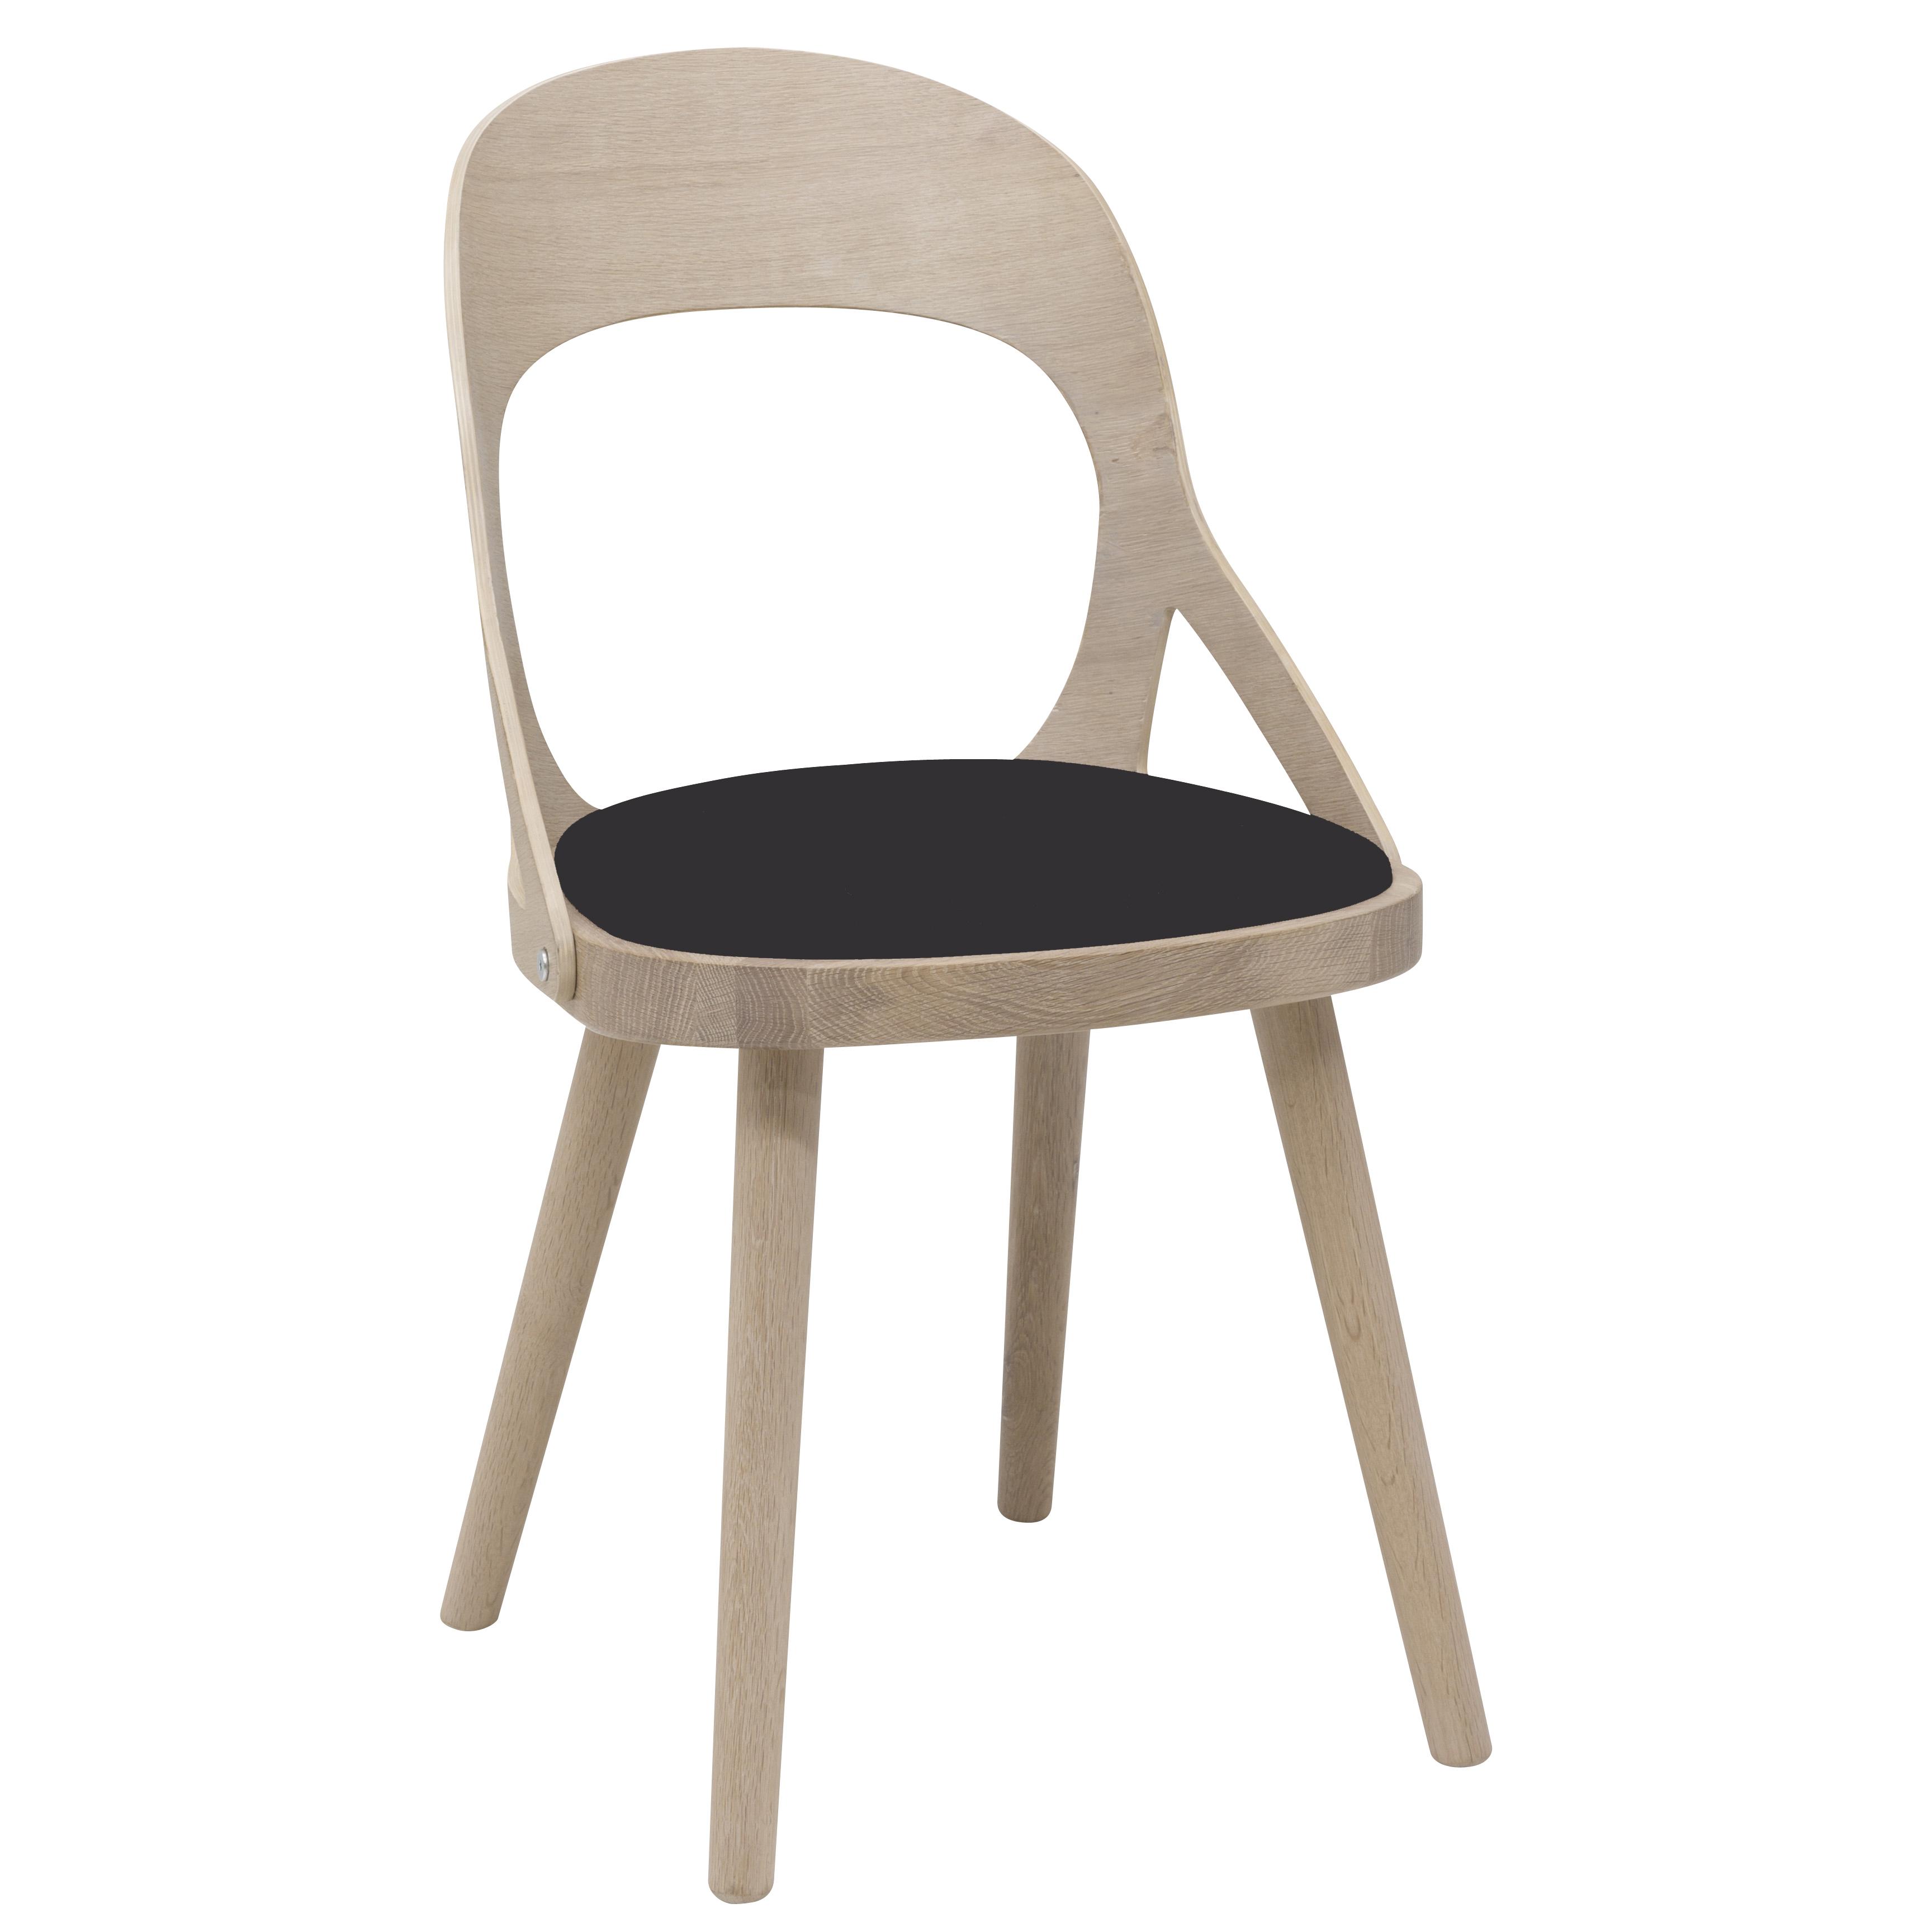 Colibri tuoli valkolakattu tammi, bonded musta, Design Markus Johansson